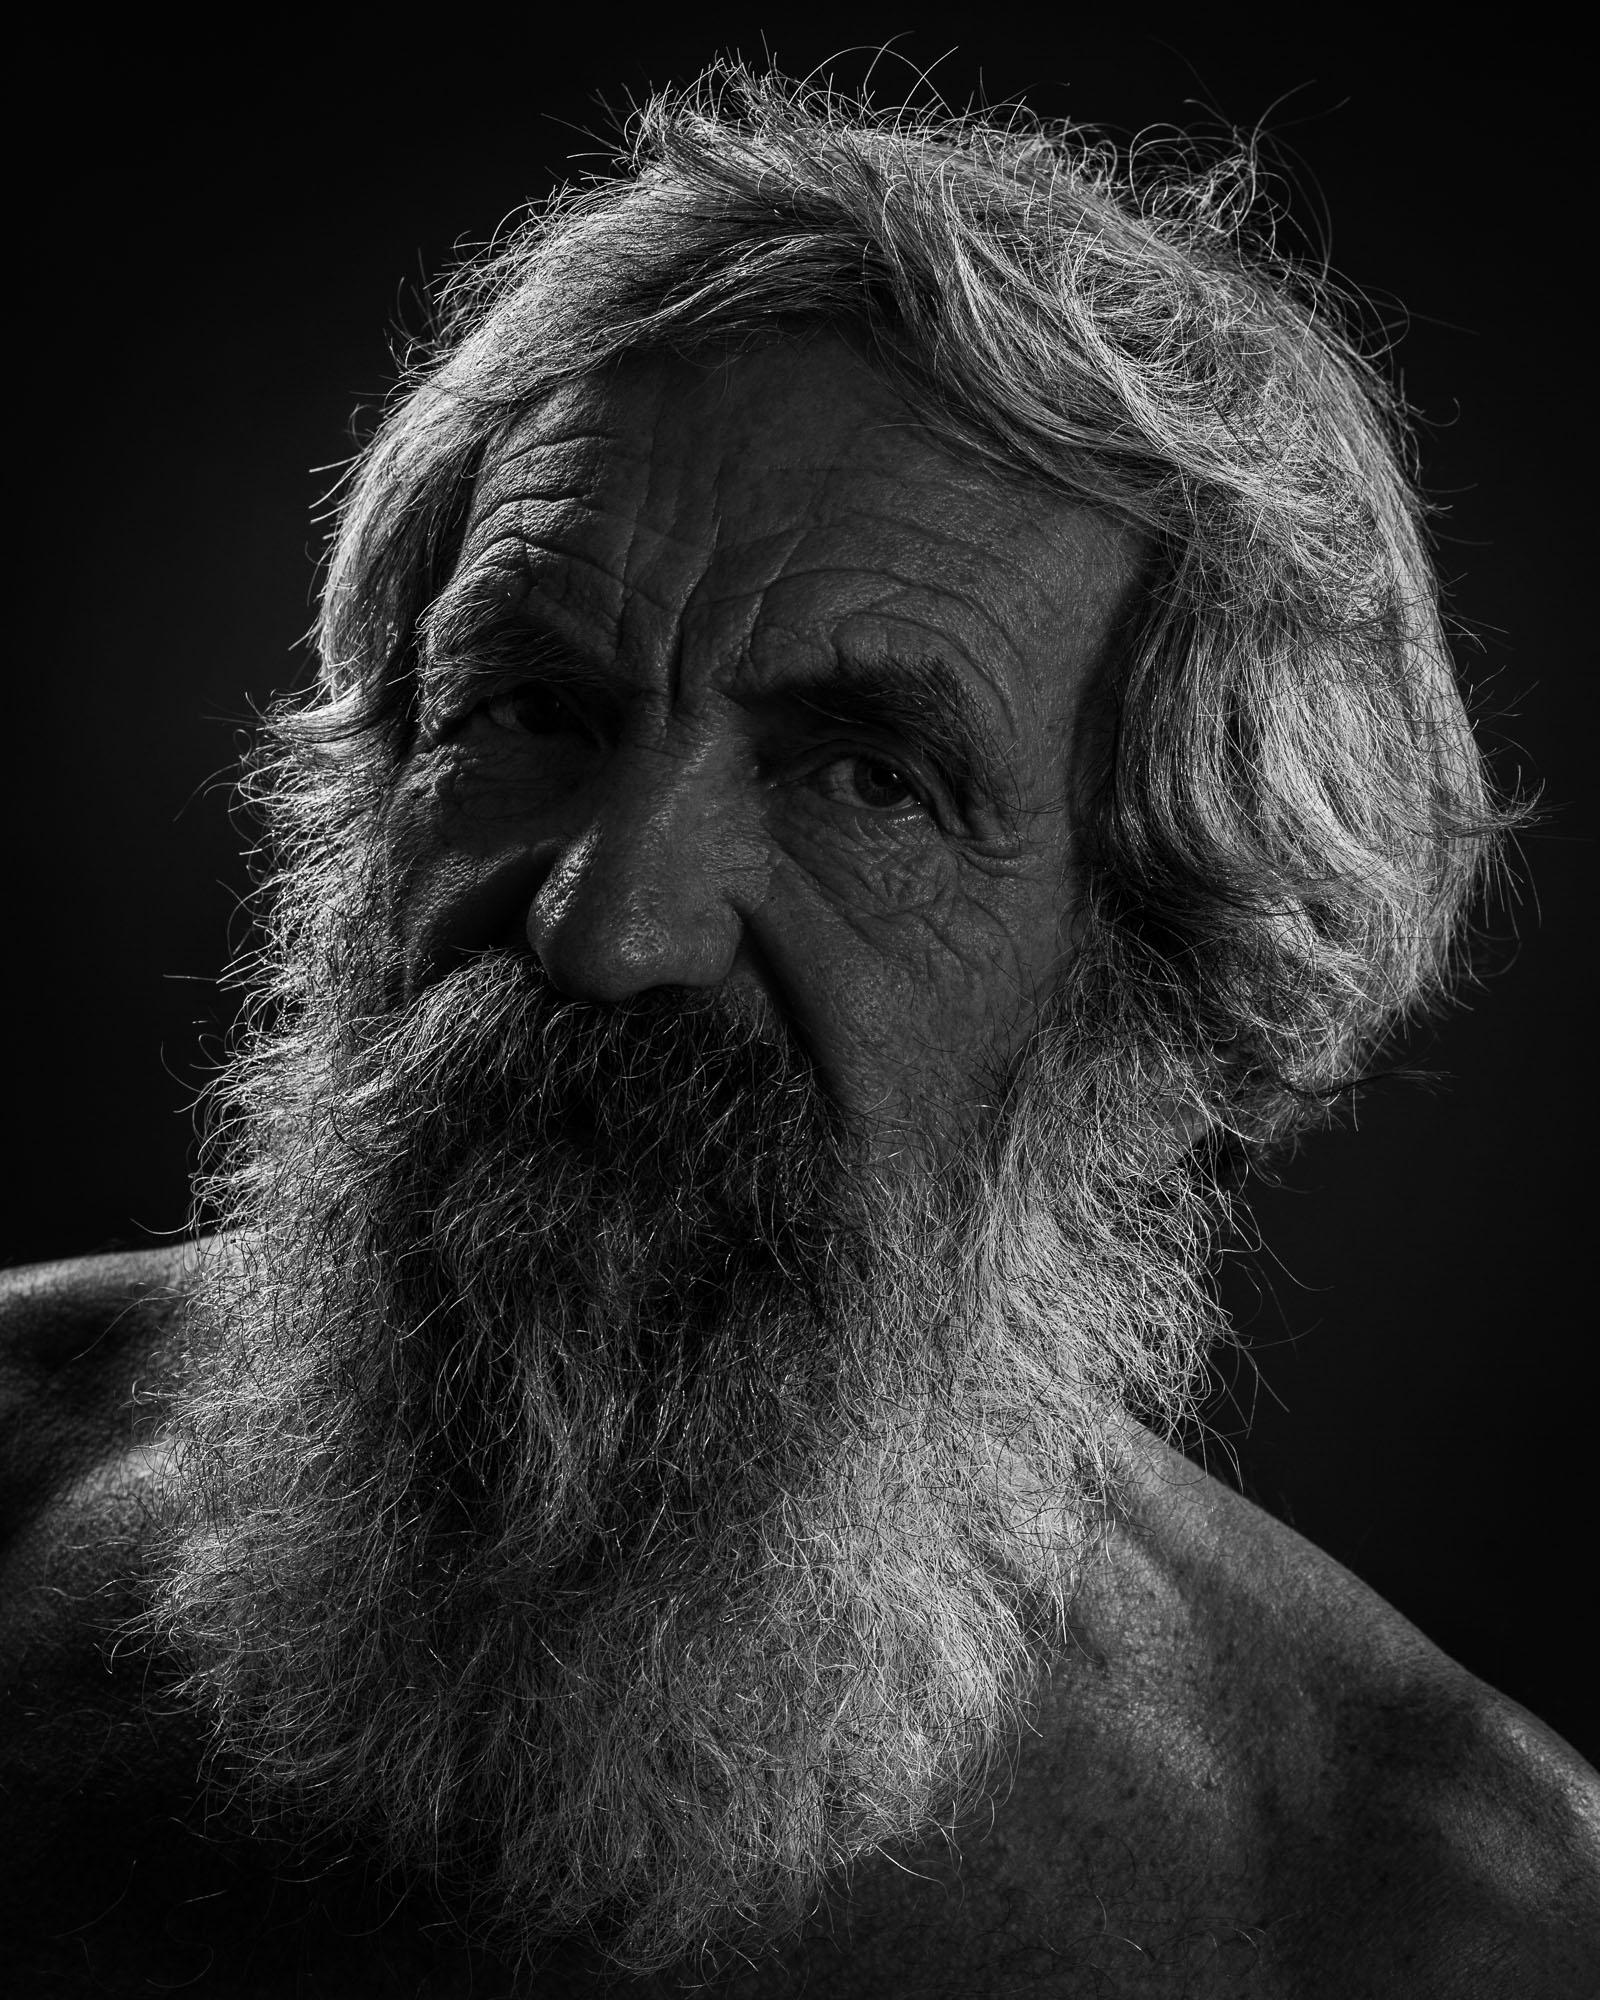 Aleksander Doba by Tomek Gola